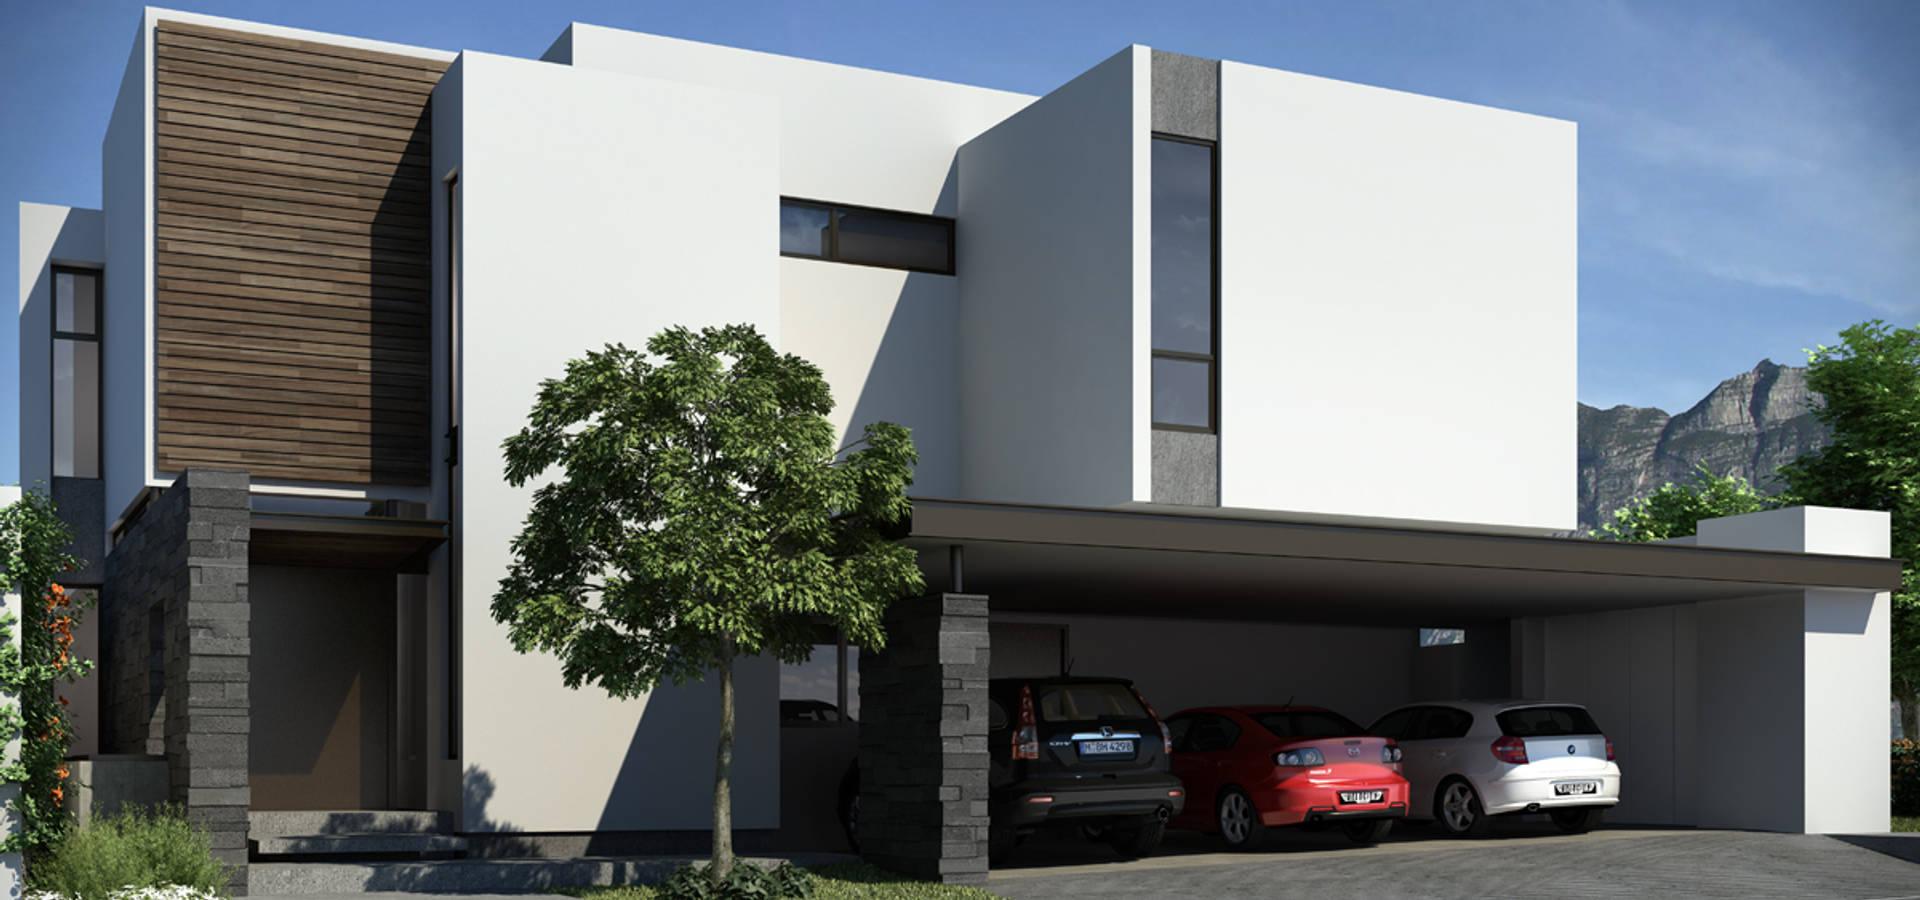 OA arquitectura